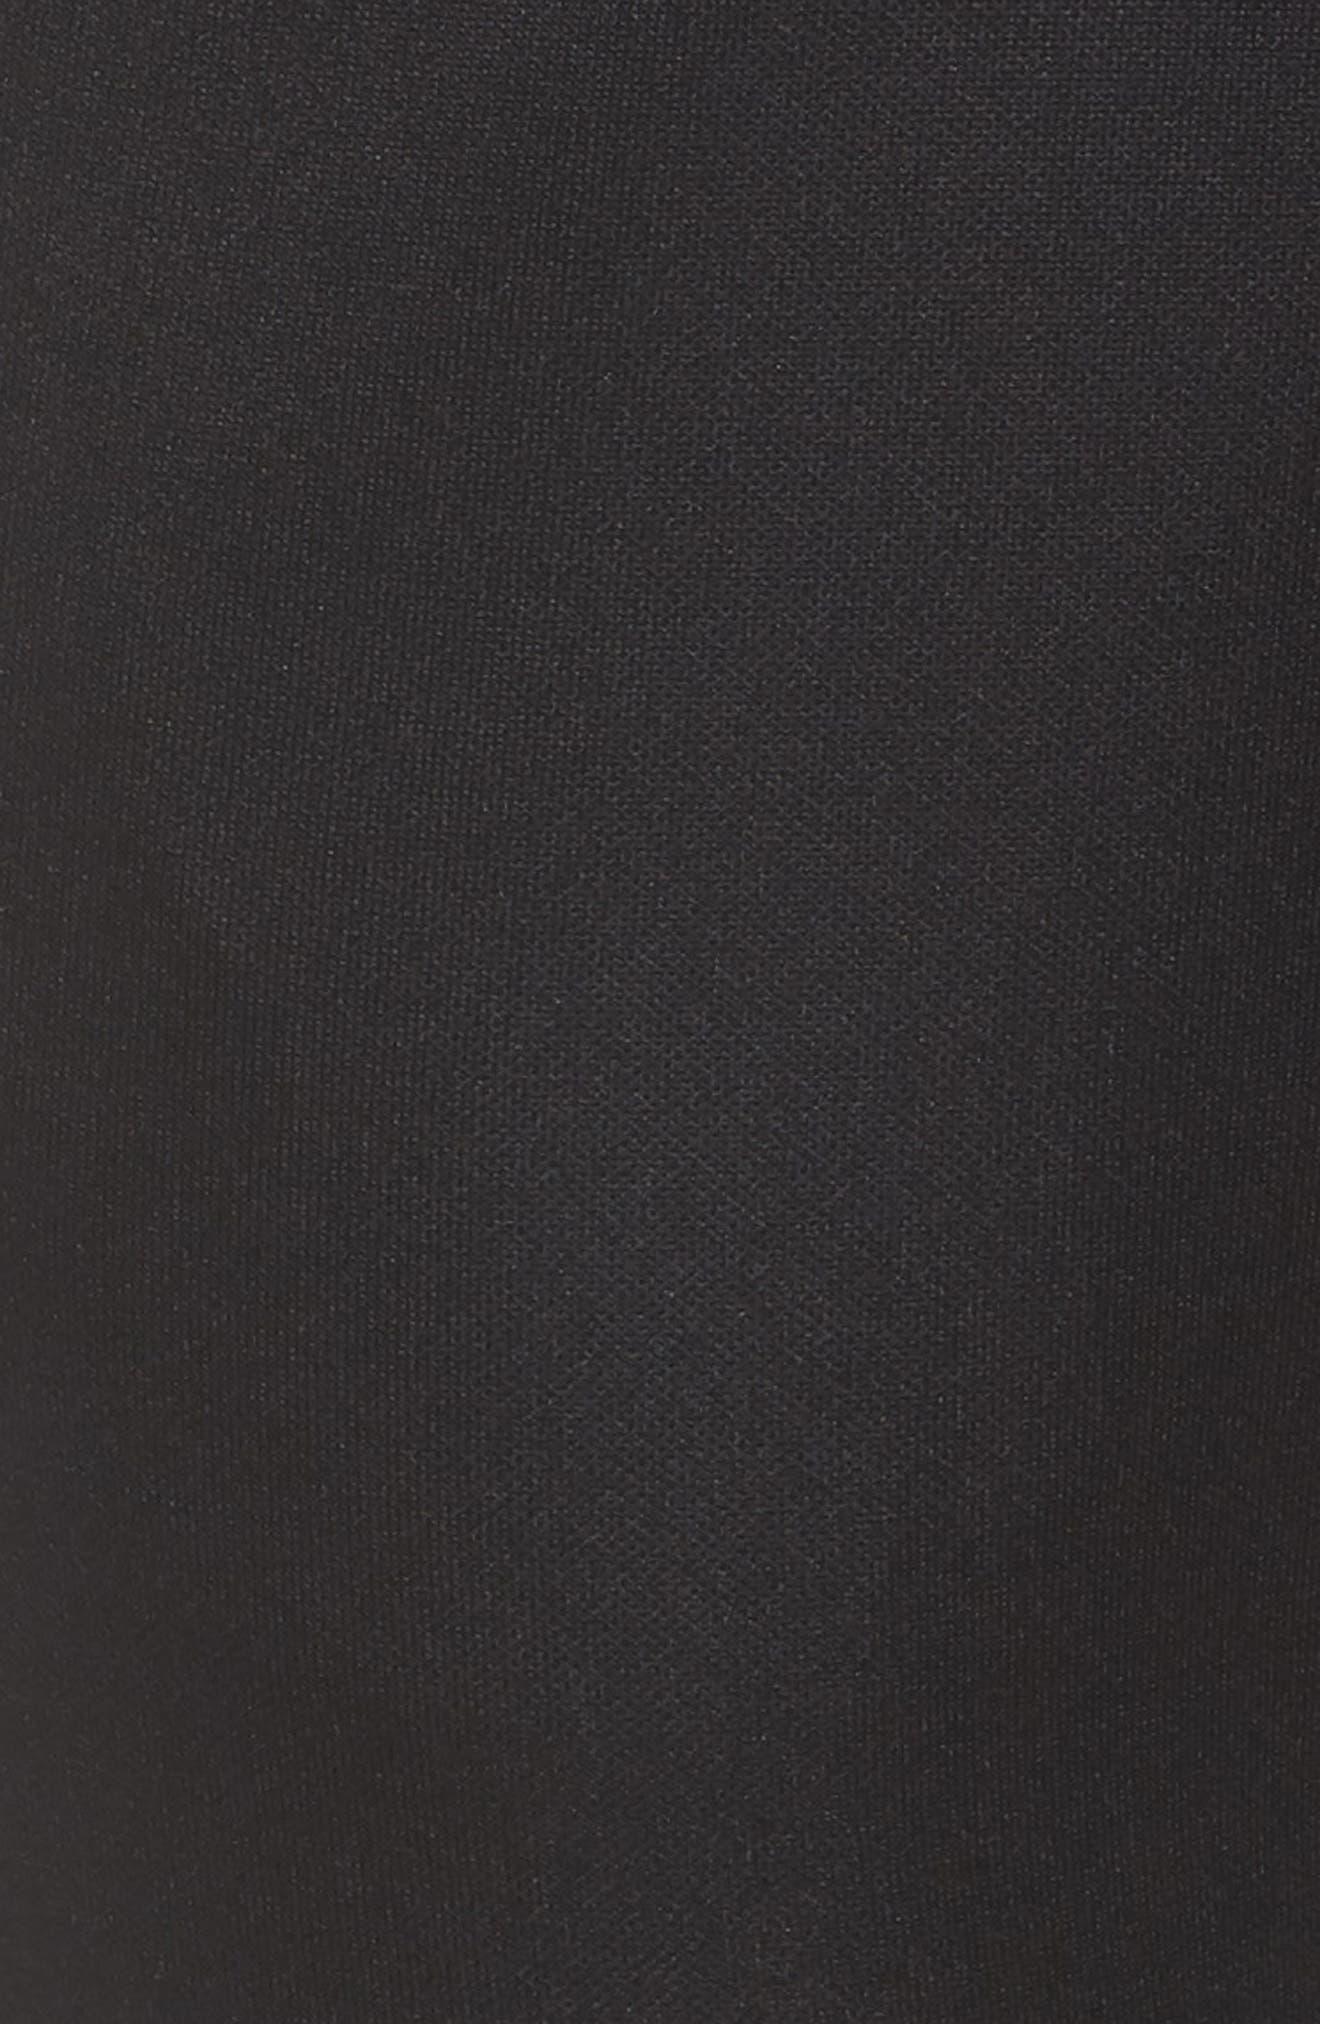 Tiro 17 Training Pants,                             Alternate thumbnail 6, color,                             BLACK/ REFLECTIVE SILVER